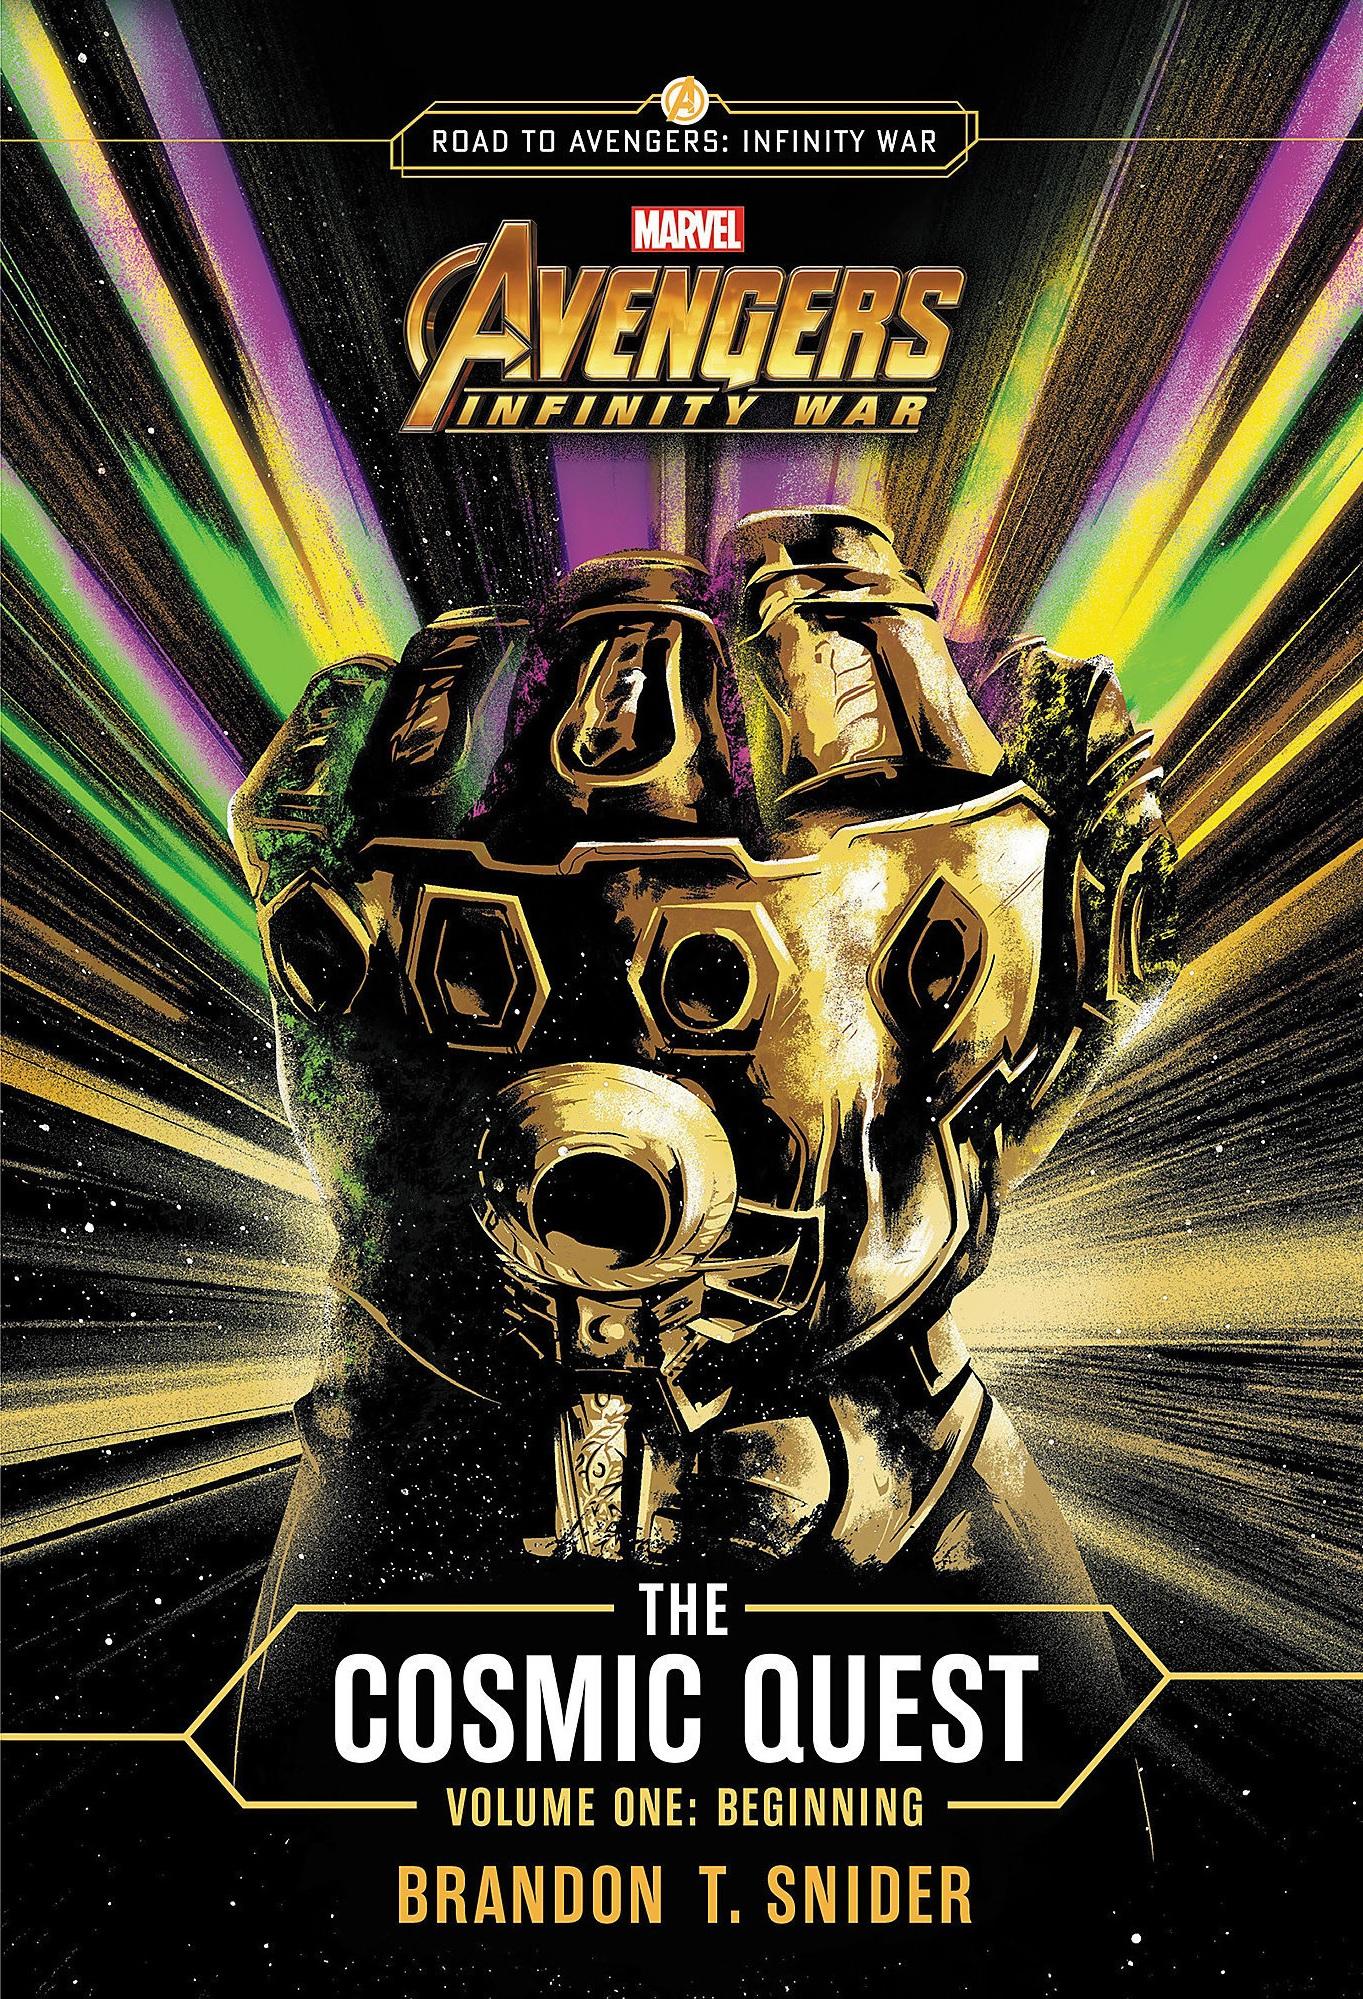 Marvel's Avengers: Infinity War: The Cosmic Quest - Volume 1: Beginning